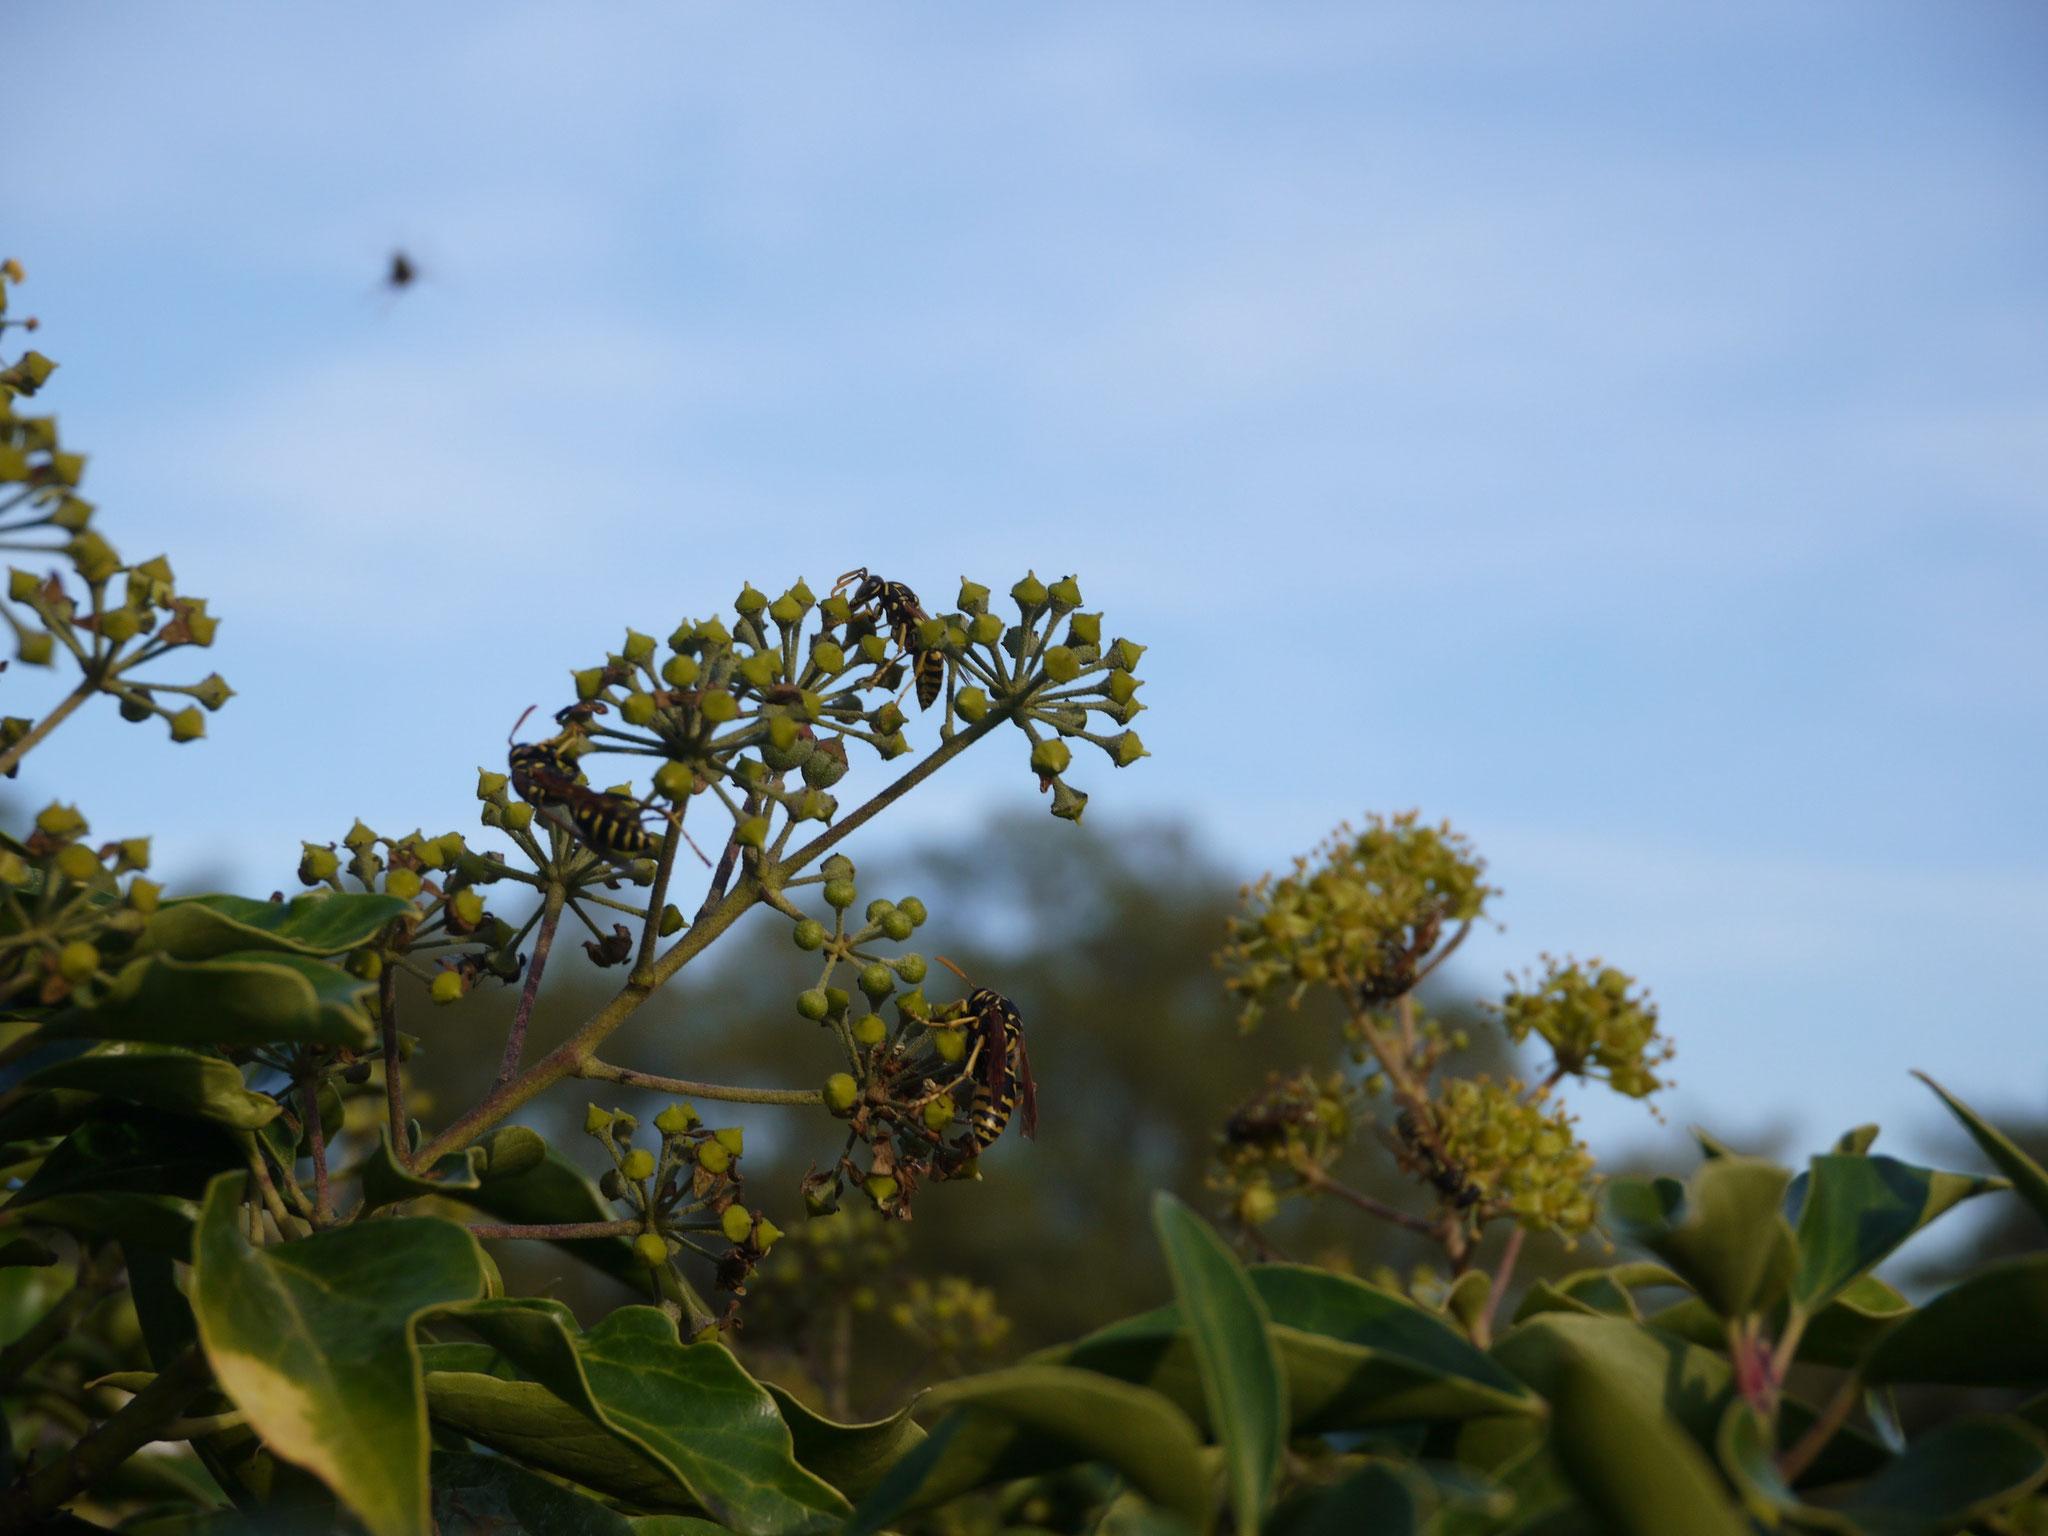 Wespen auf Efeublüten; Foto: Michael Wetzel